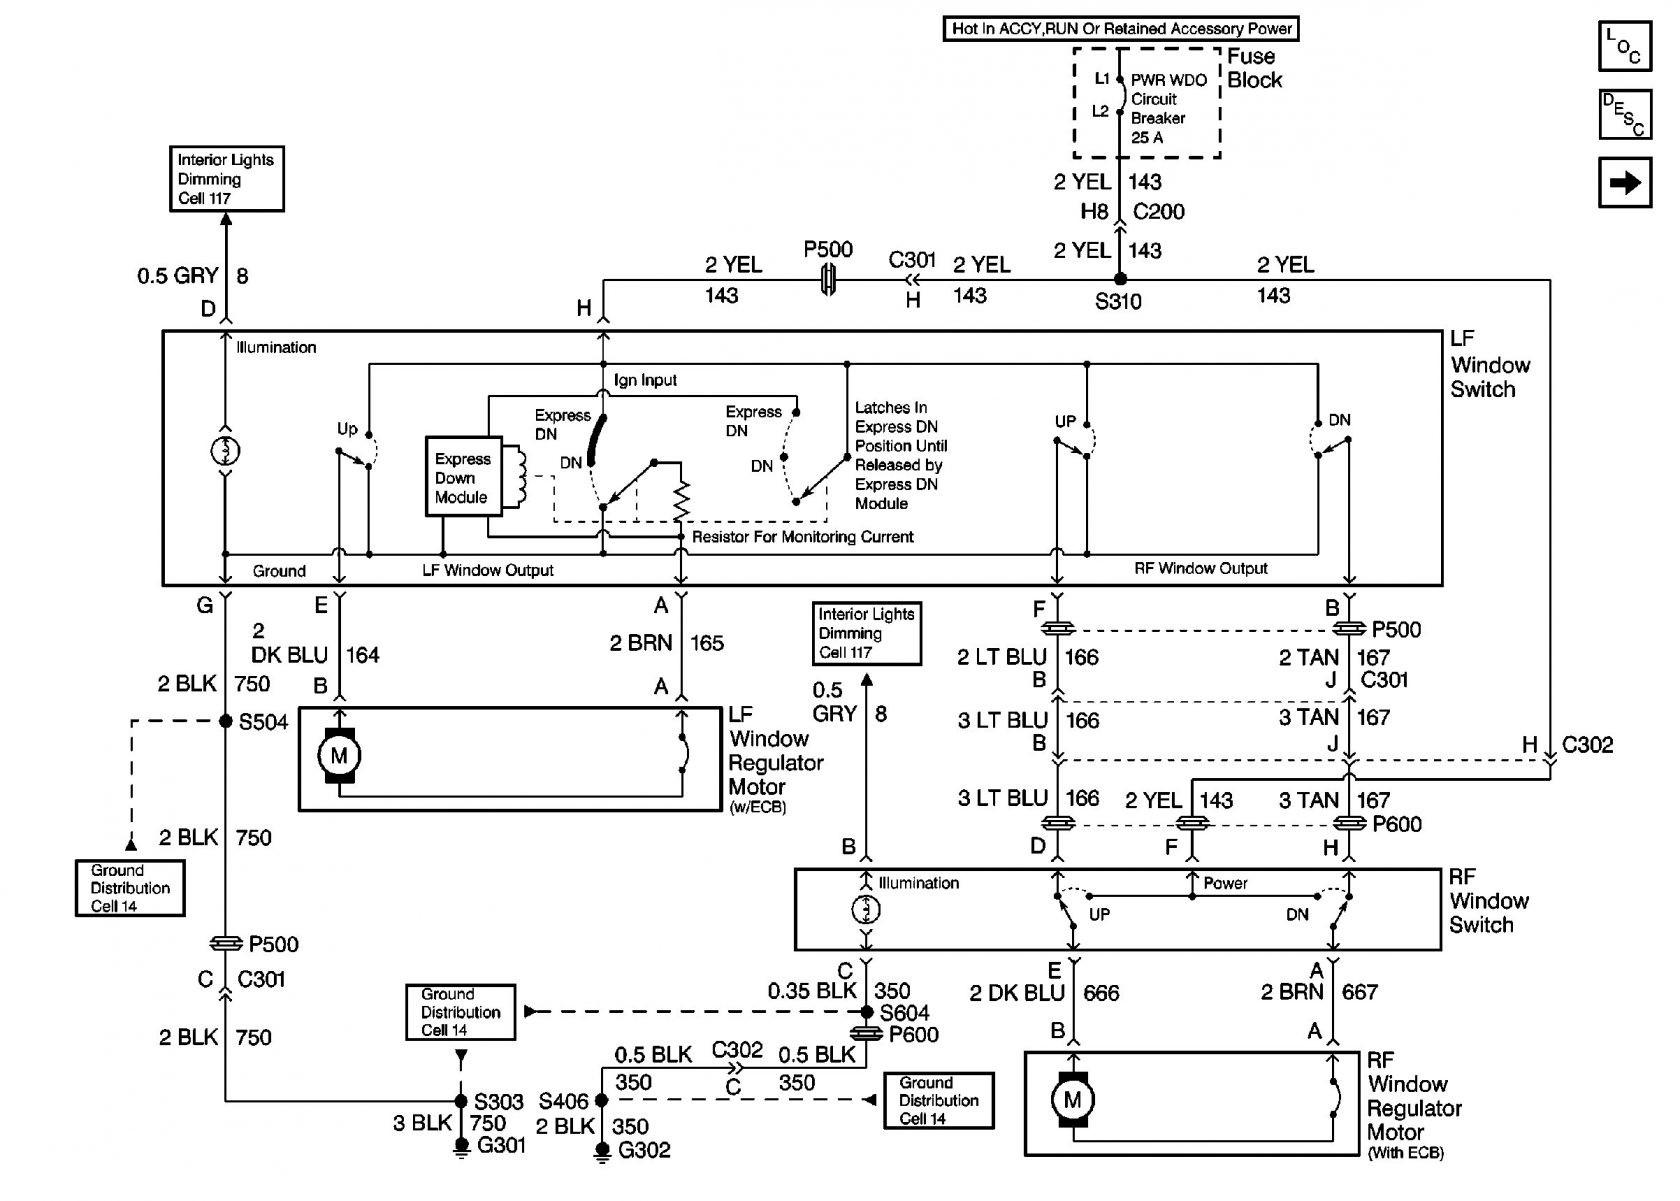 Subaru 2 5 Engine Diagram Diagram Subaru forester Wiring Radio Headlight 2001 Fuel Pump Of Subaru 2 5 Engine Diagram